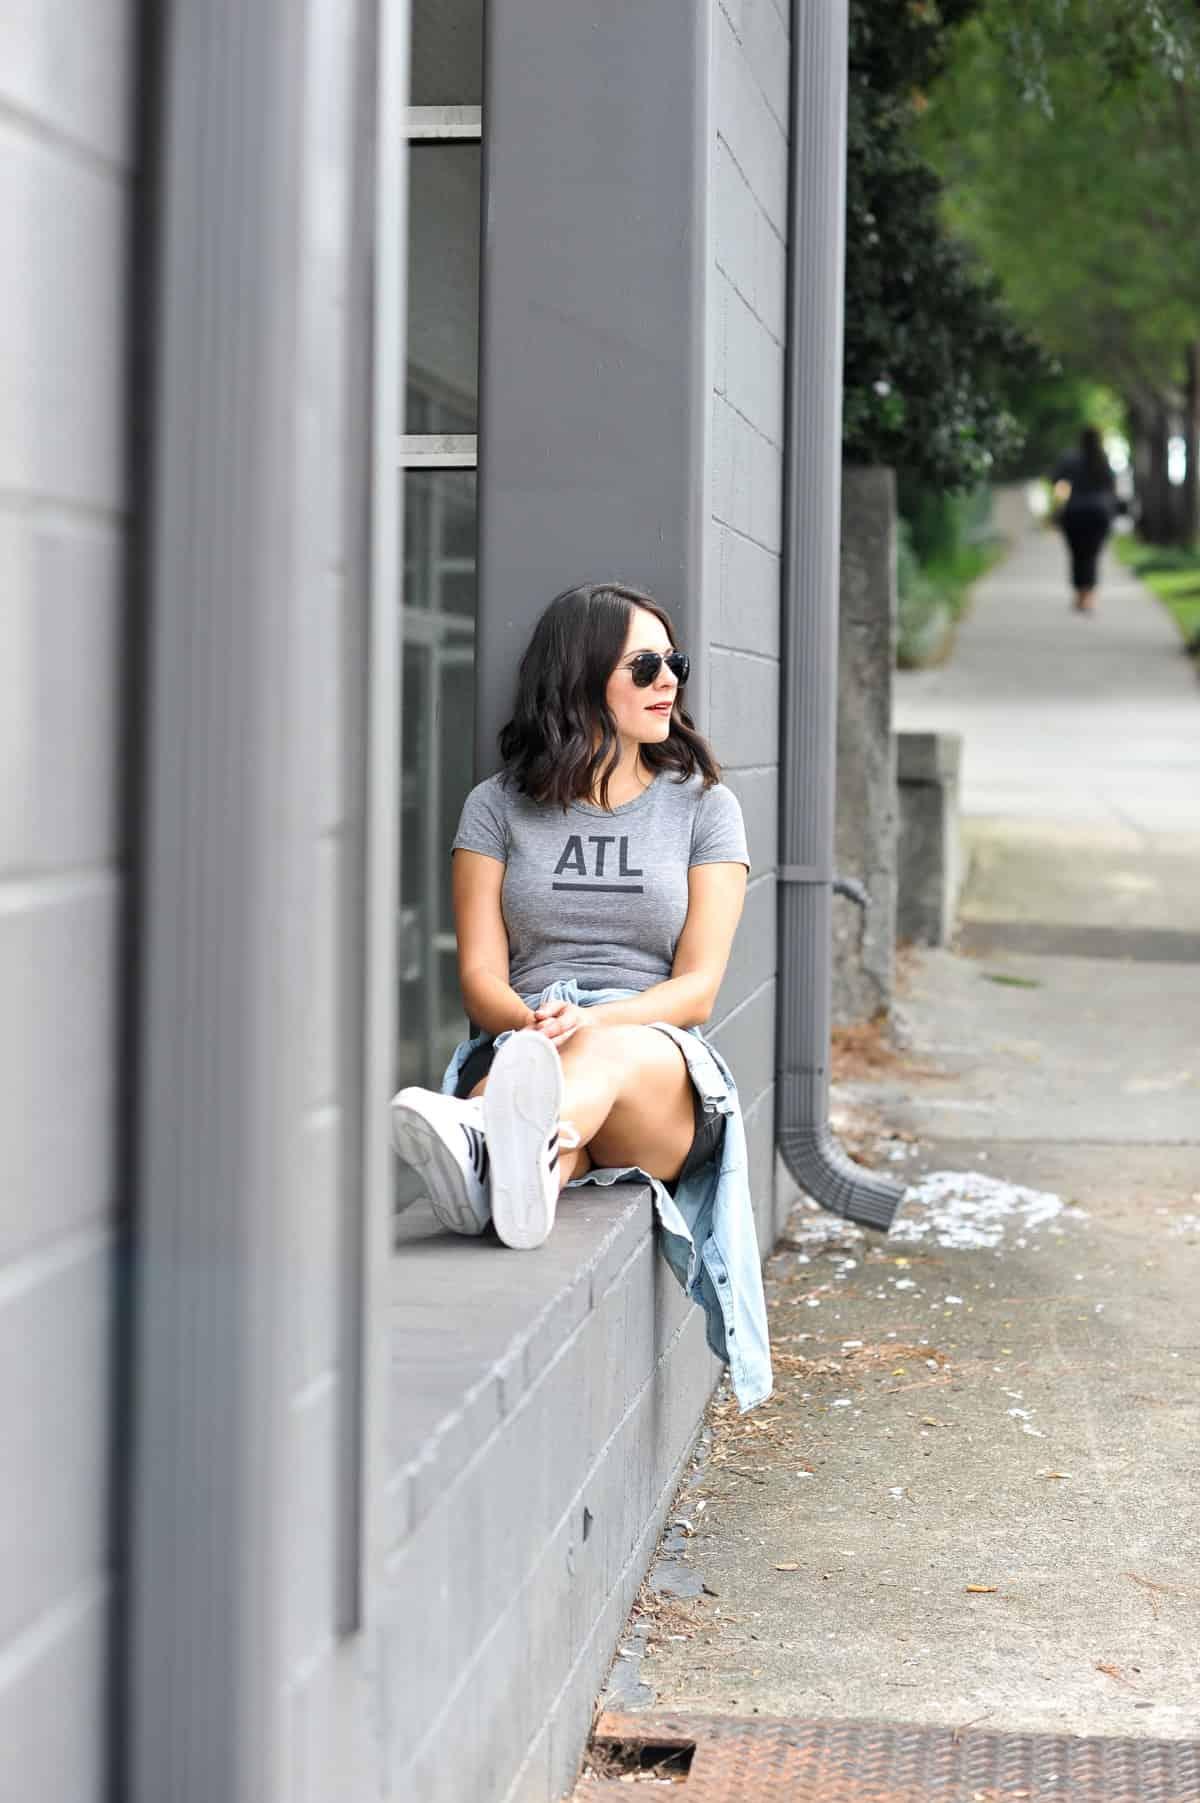 best atlanta based clothing brands, affordable outfit ideas, Adidas Superstars - My Style Vita - @mystylevita - 13